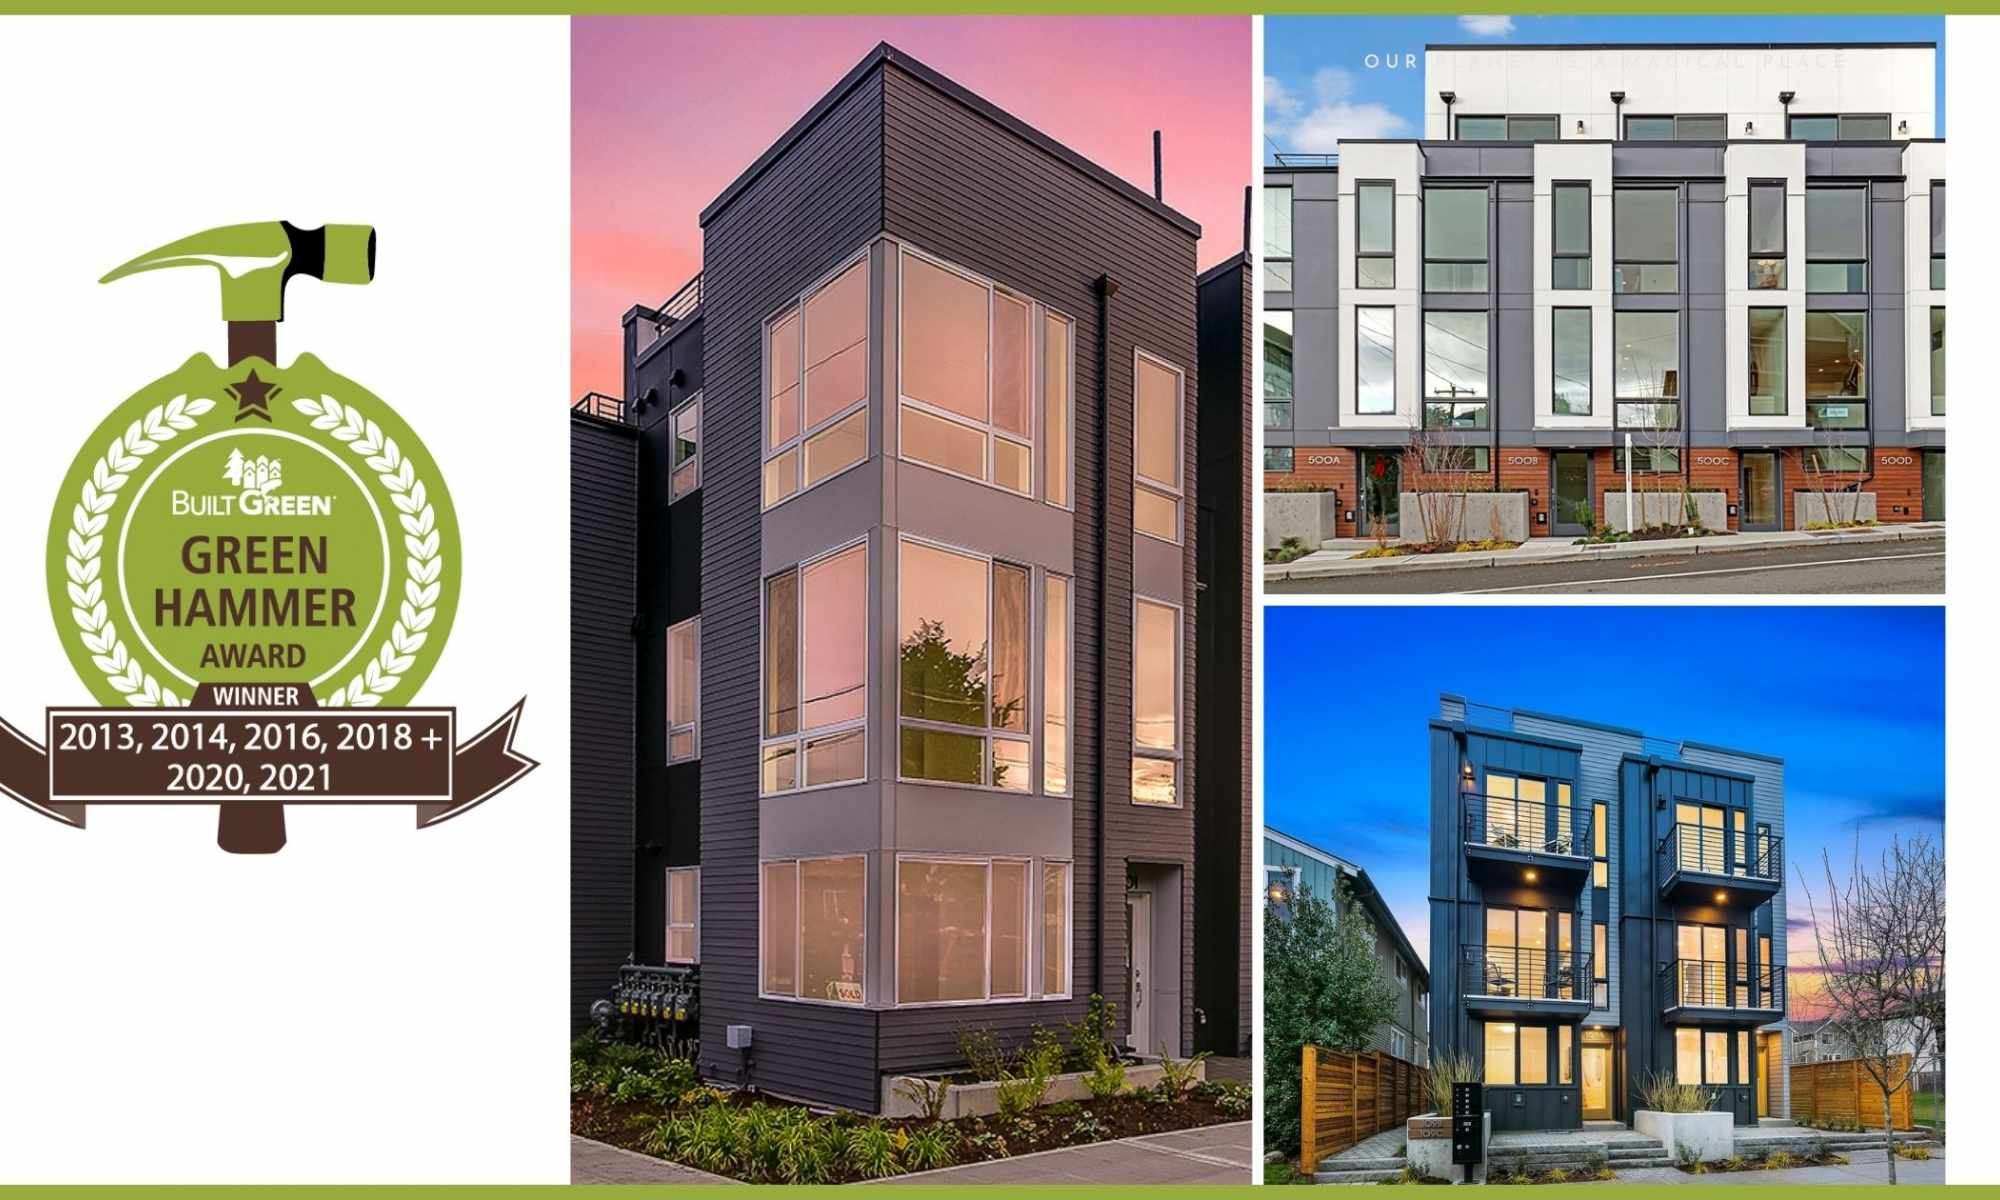 Isola Homes Wins a Built Green Hammer Award